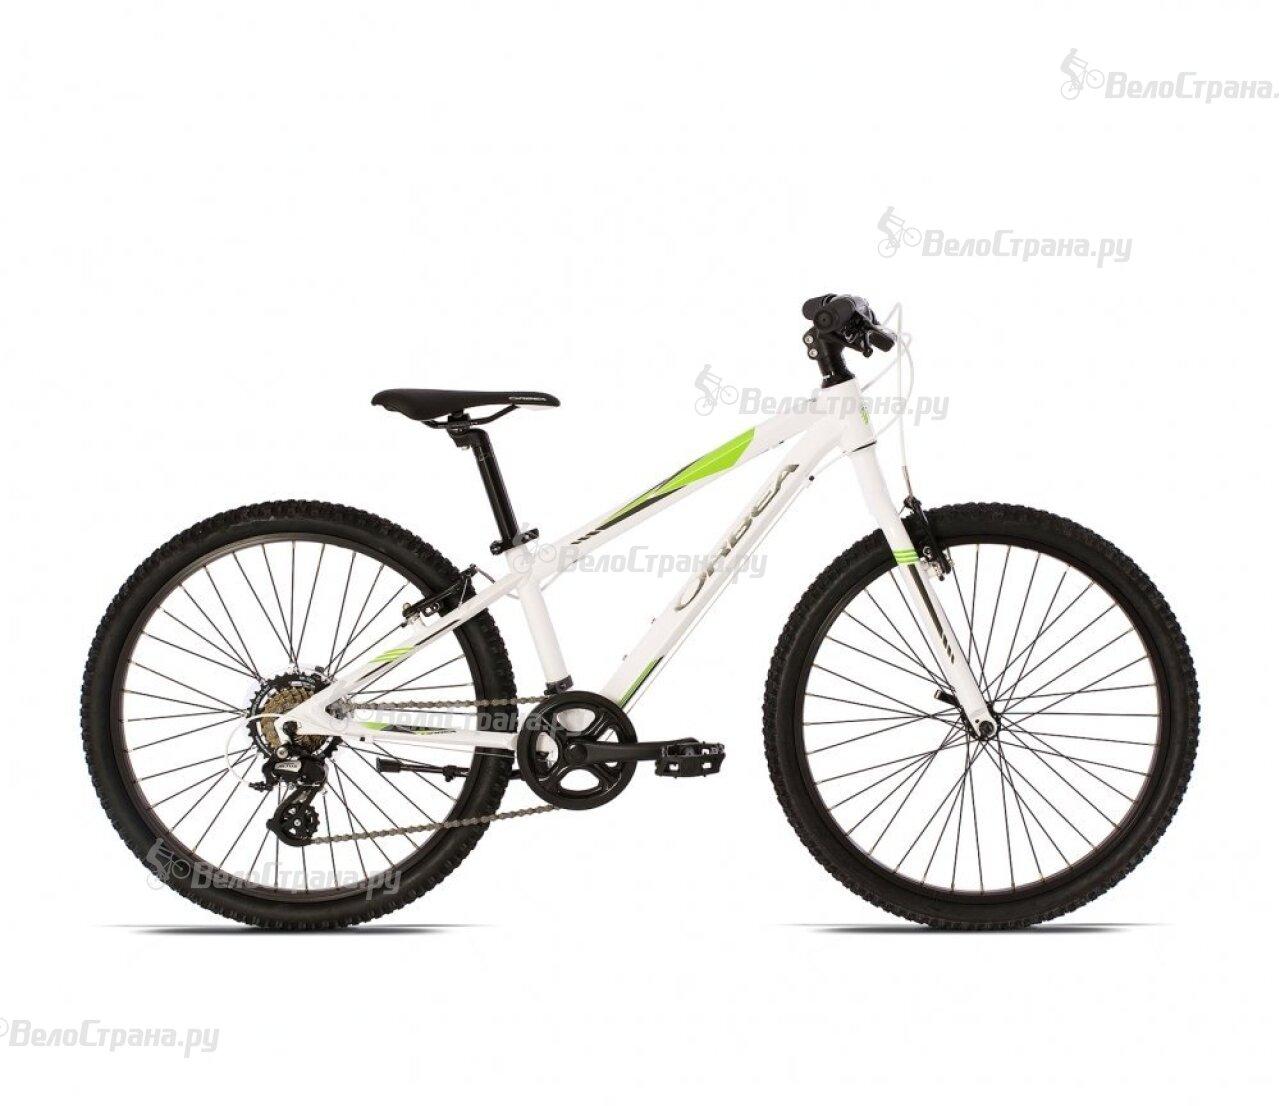 все цены на Велосипед Orbea Mx 24 Dirt (2014) онлайн